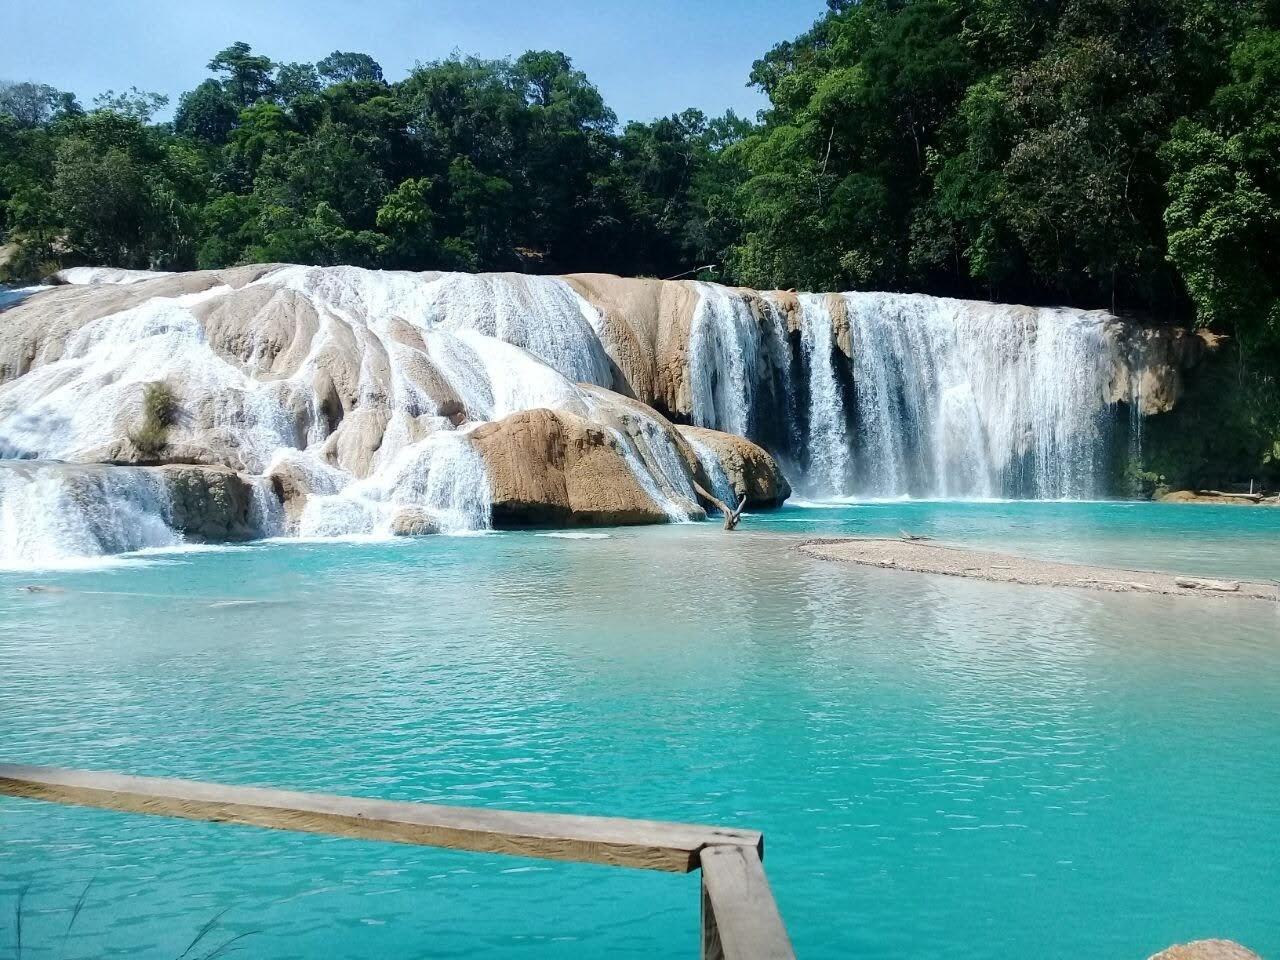 Palenque, A. Azul, MisolHa, Sn Cristobal